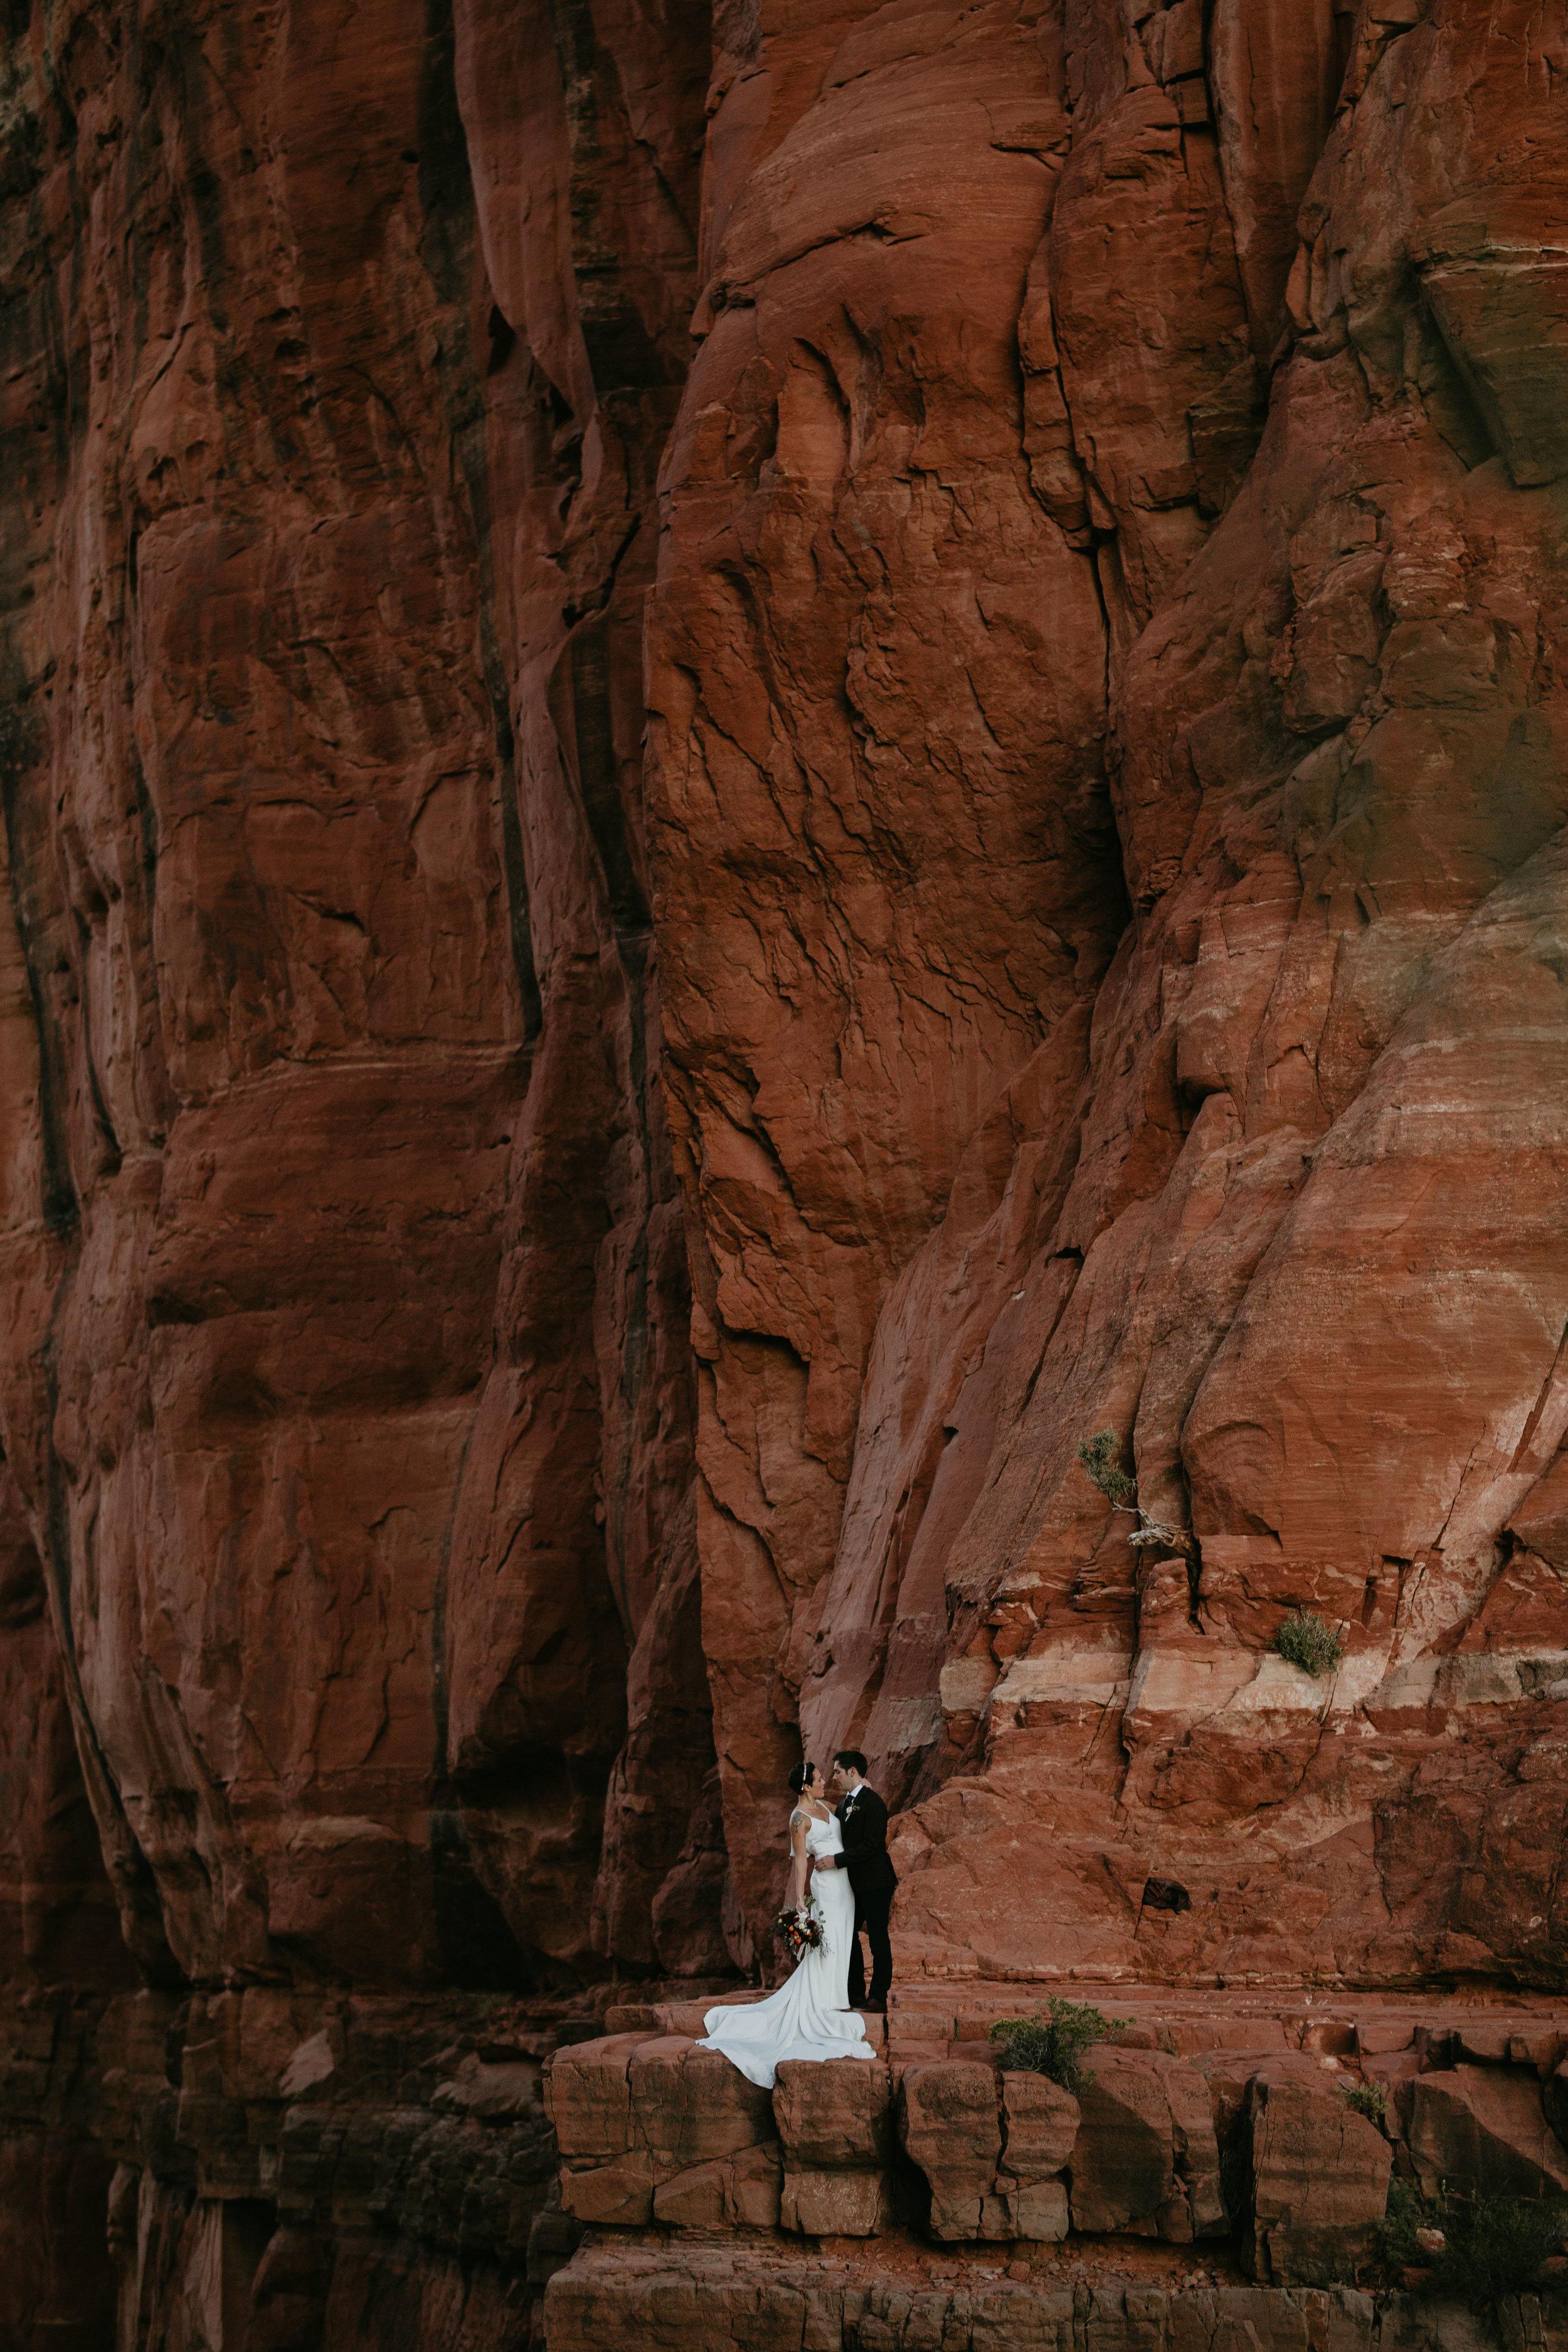 nicole-daacke-photography-sedona-arizona-destination-elopement-wedding-photographer-catherdral-rock-hiking-elopement-sedona-river-elopement-photos-desert-rock-wedding-photographer-laid-back-spontaneous-elopement-22.jpg